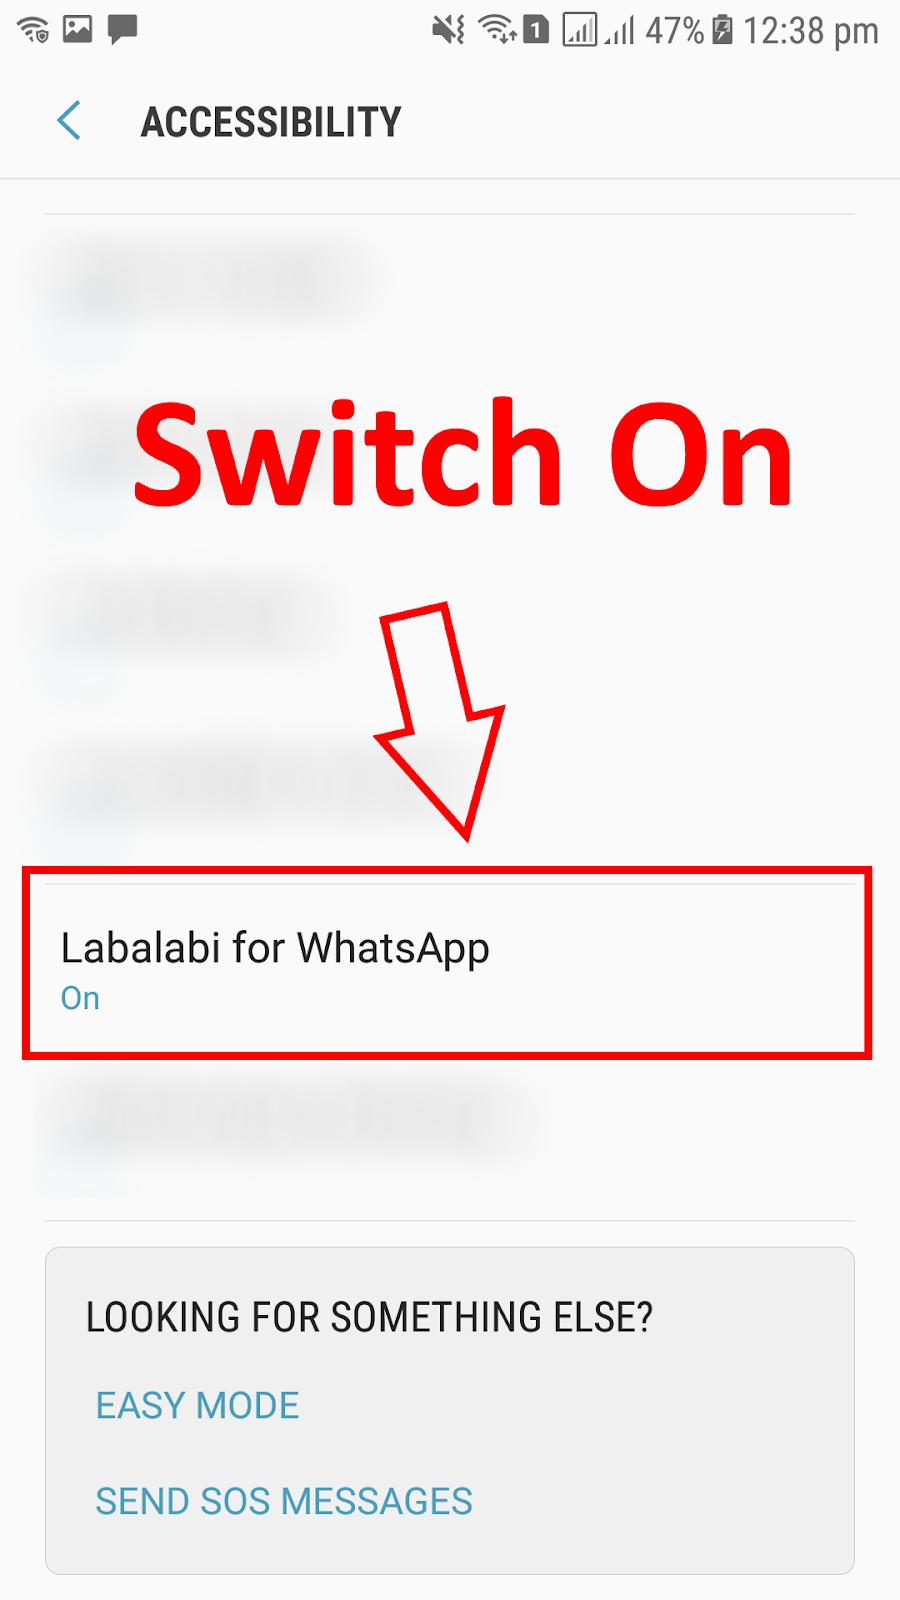 All Social Marketing Apps and Tips: Labalabi for whatsapp (WhatsApp